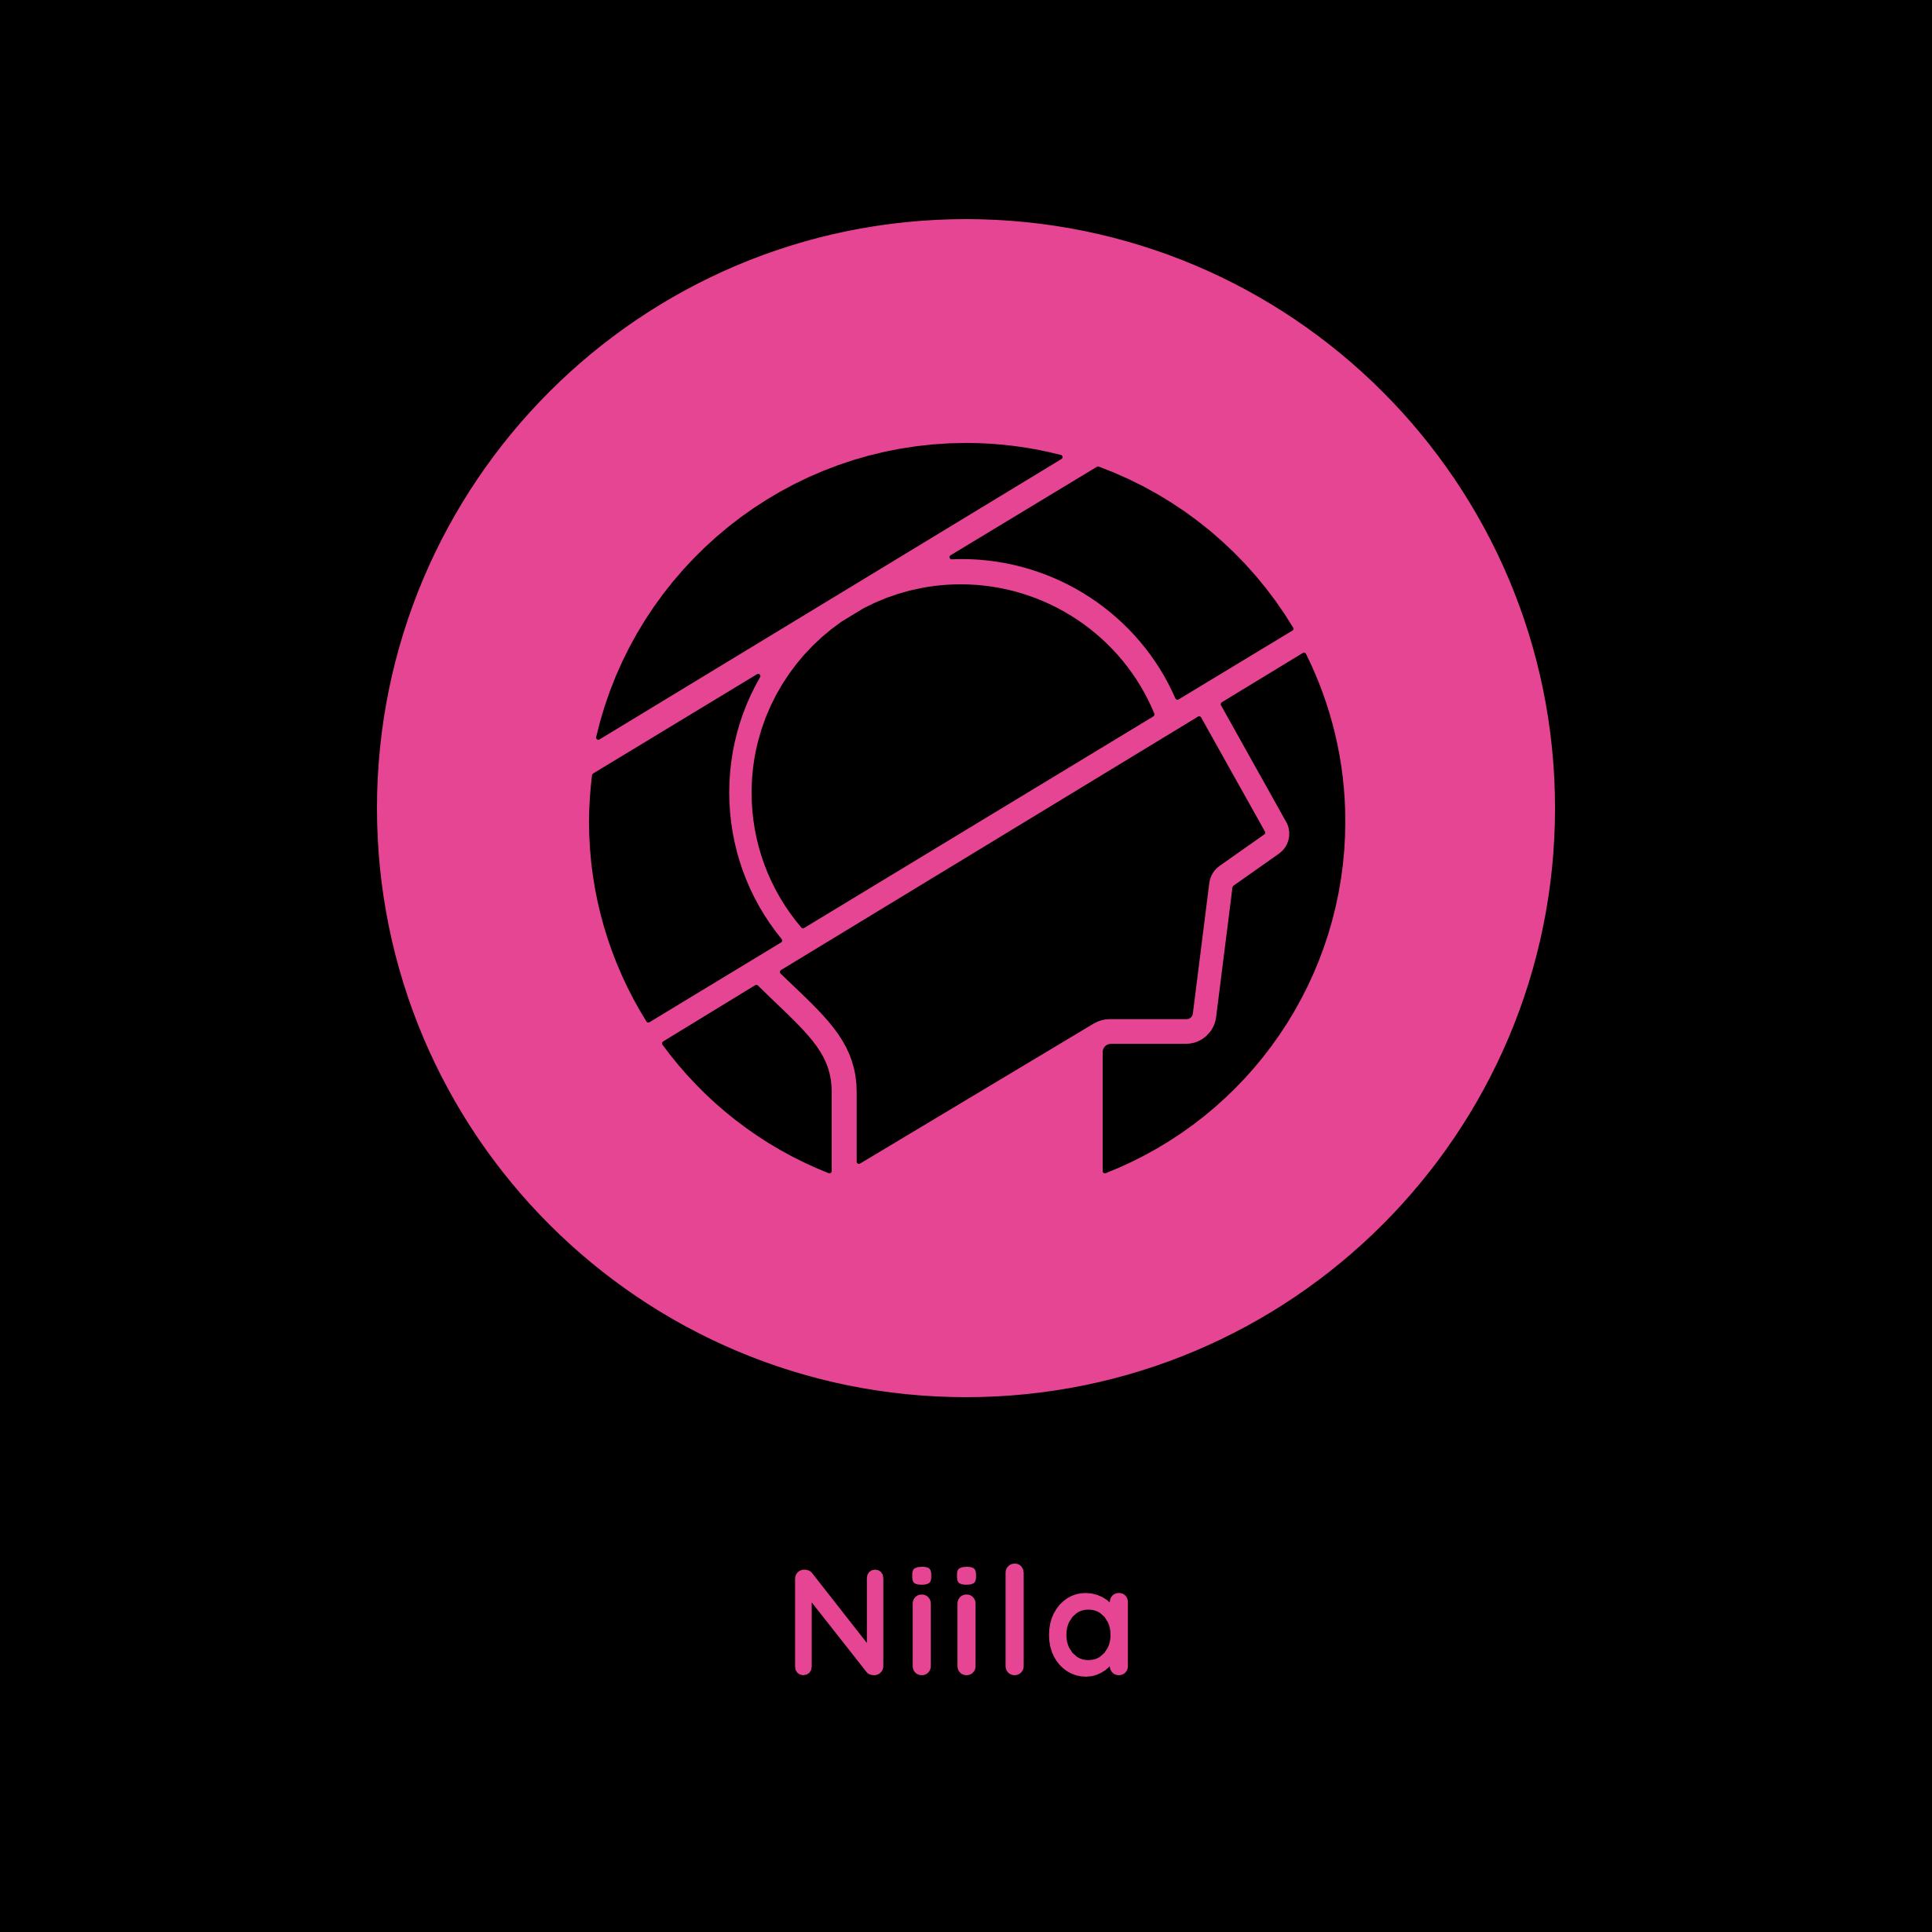 Niila logo